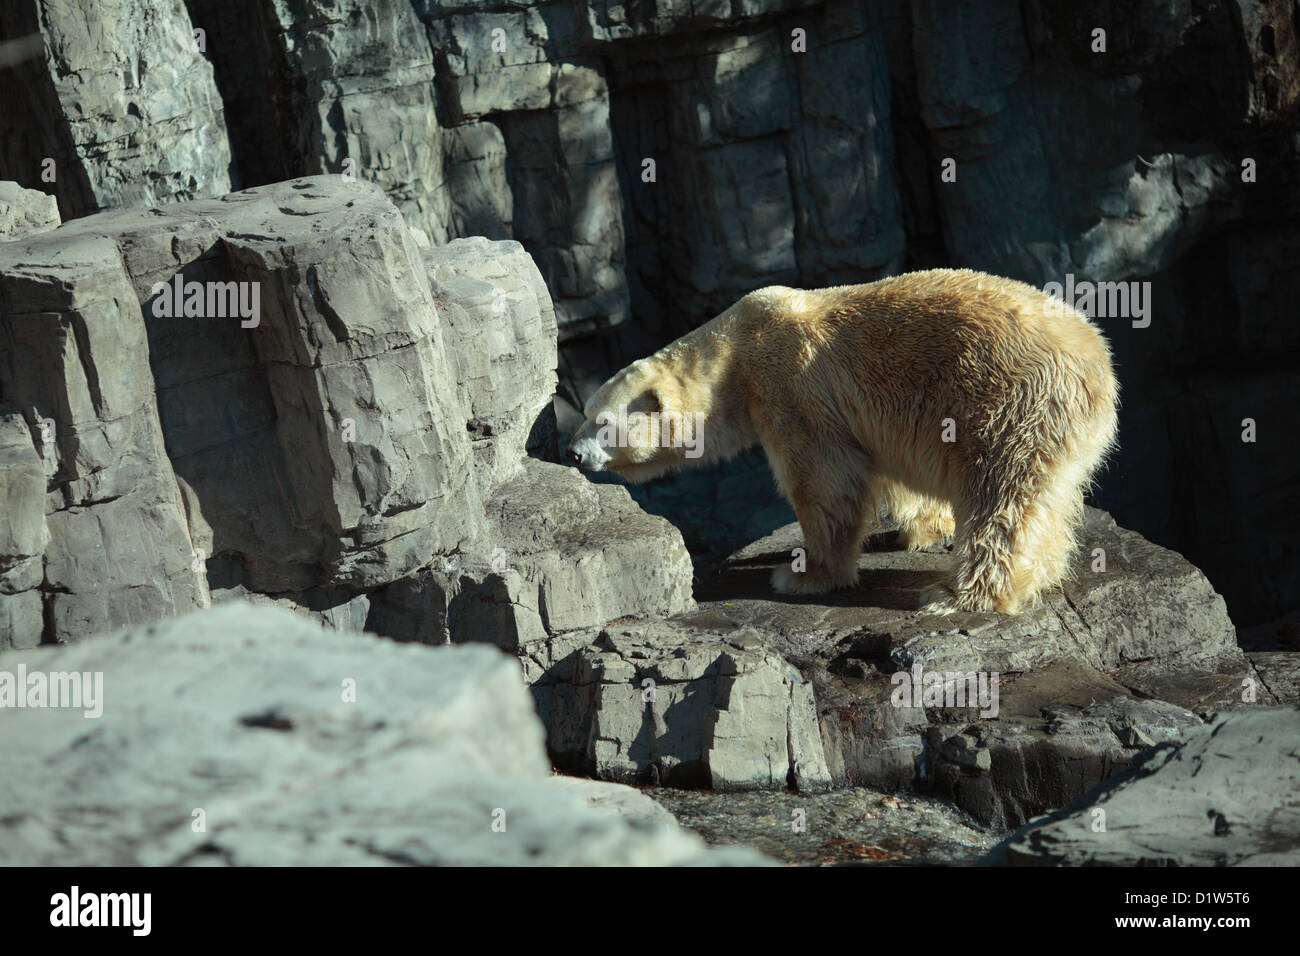 bear dating new york city